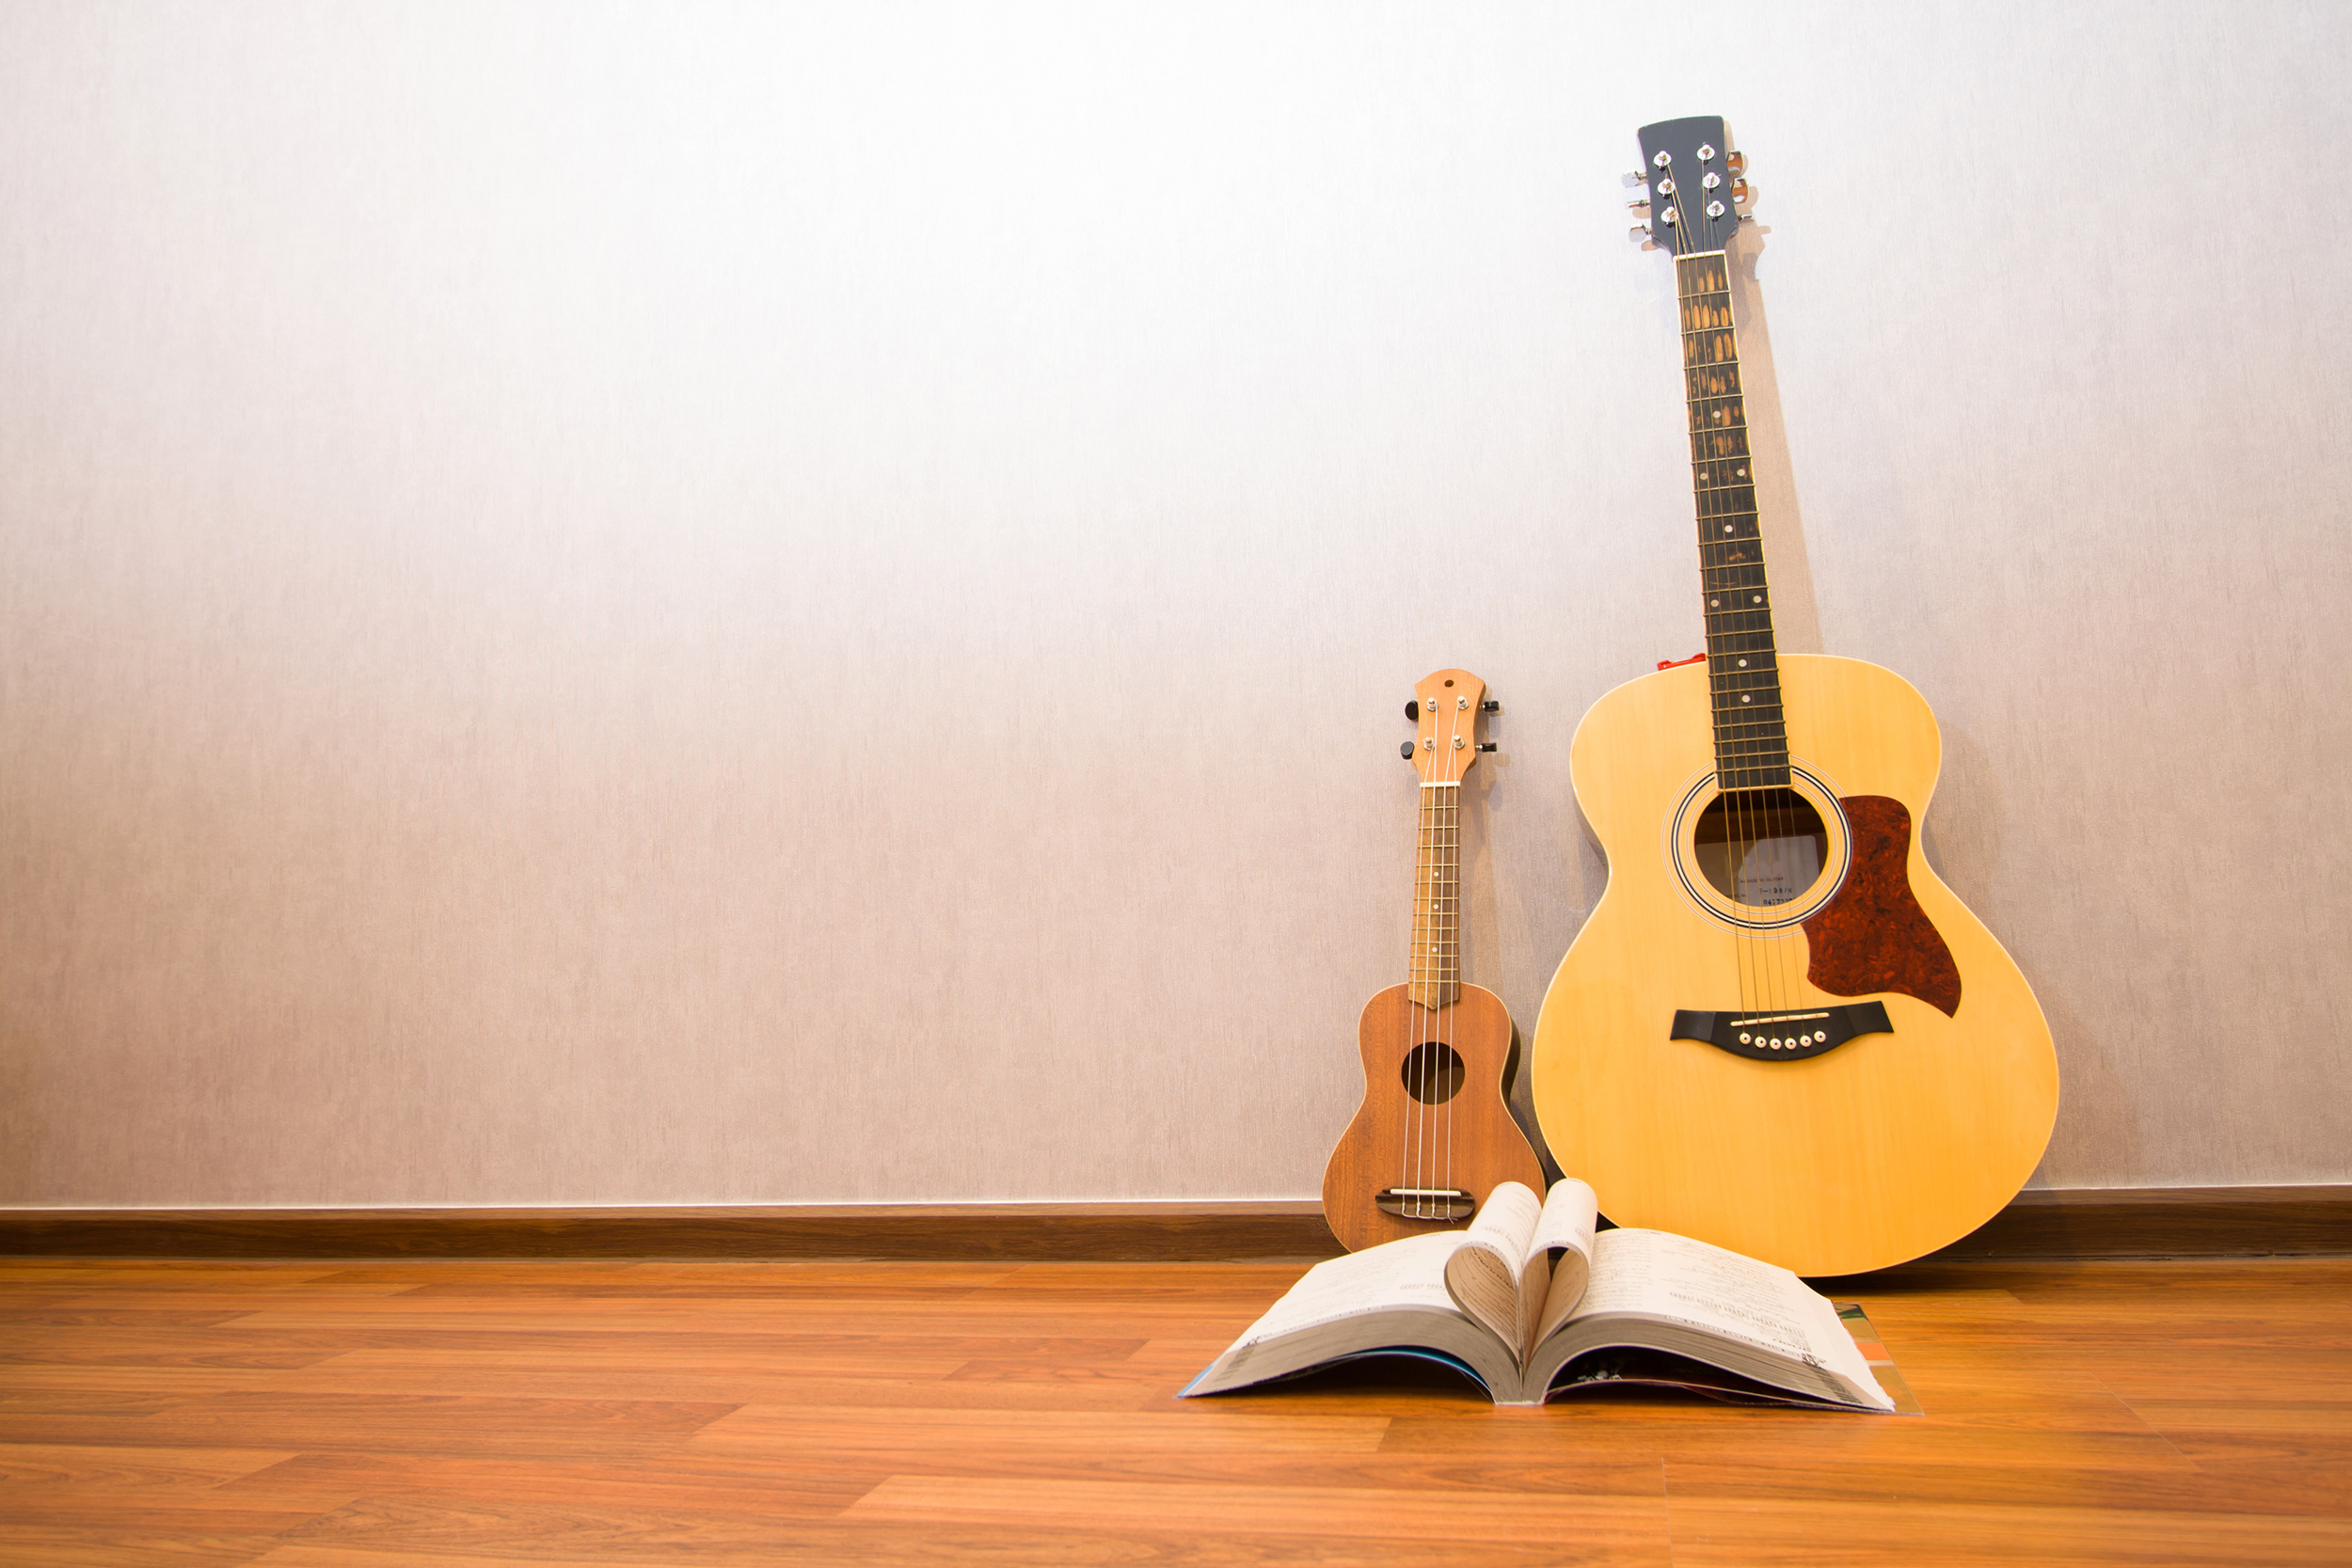 musical instruments guitar ukulele and h